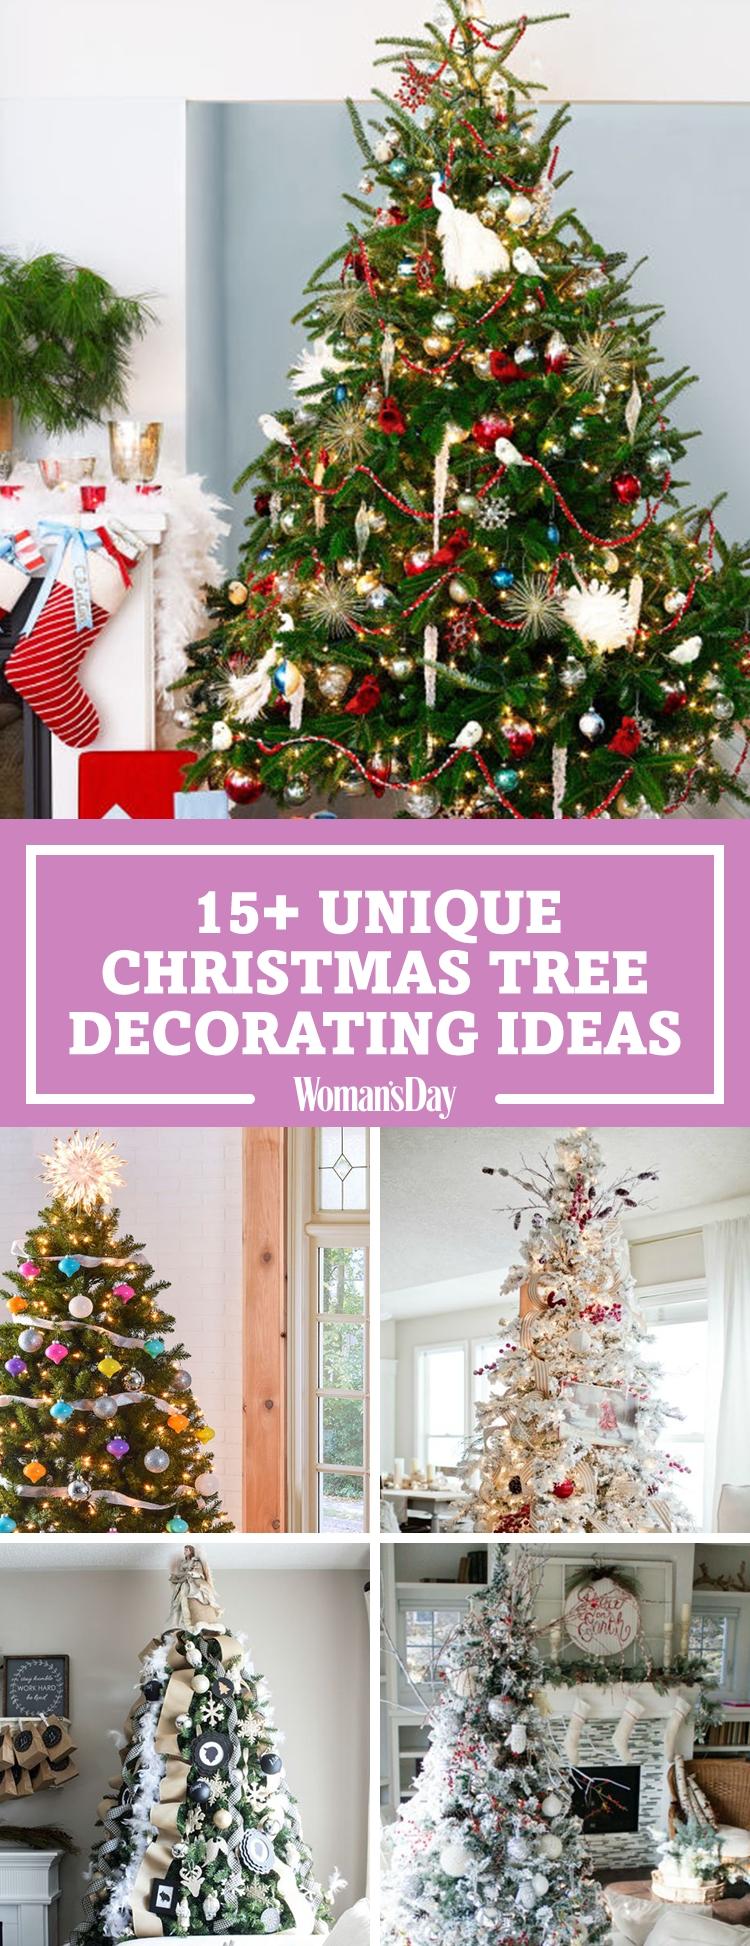 10 Pretty Unique Christmas Tree Decorating Ideas 25 unique christmas tree decoration ideas pictures of decorated